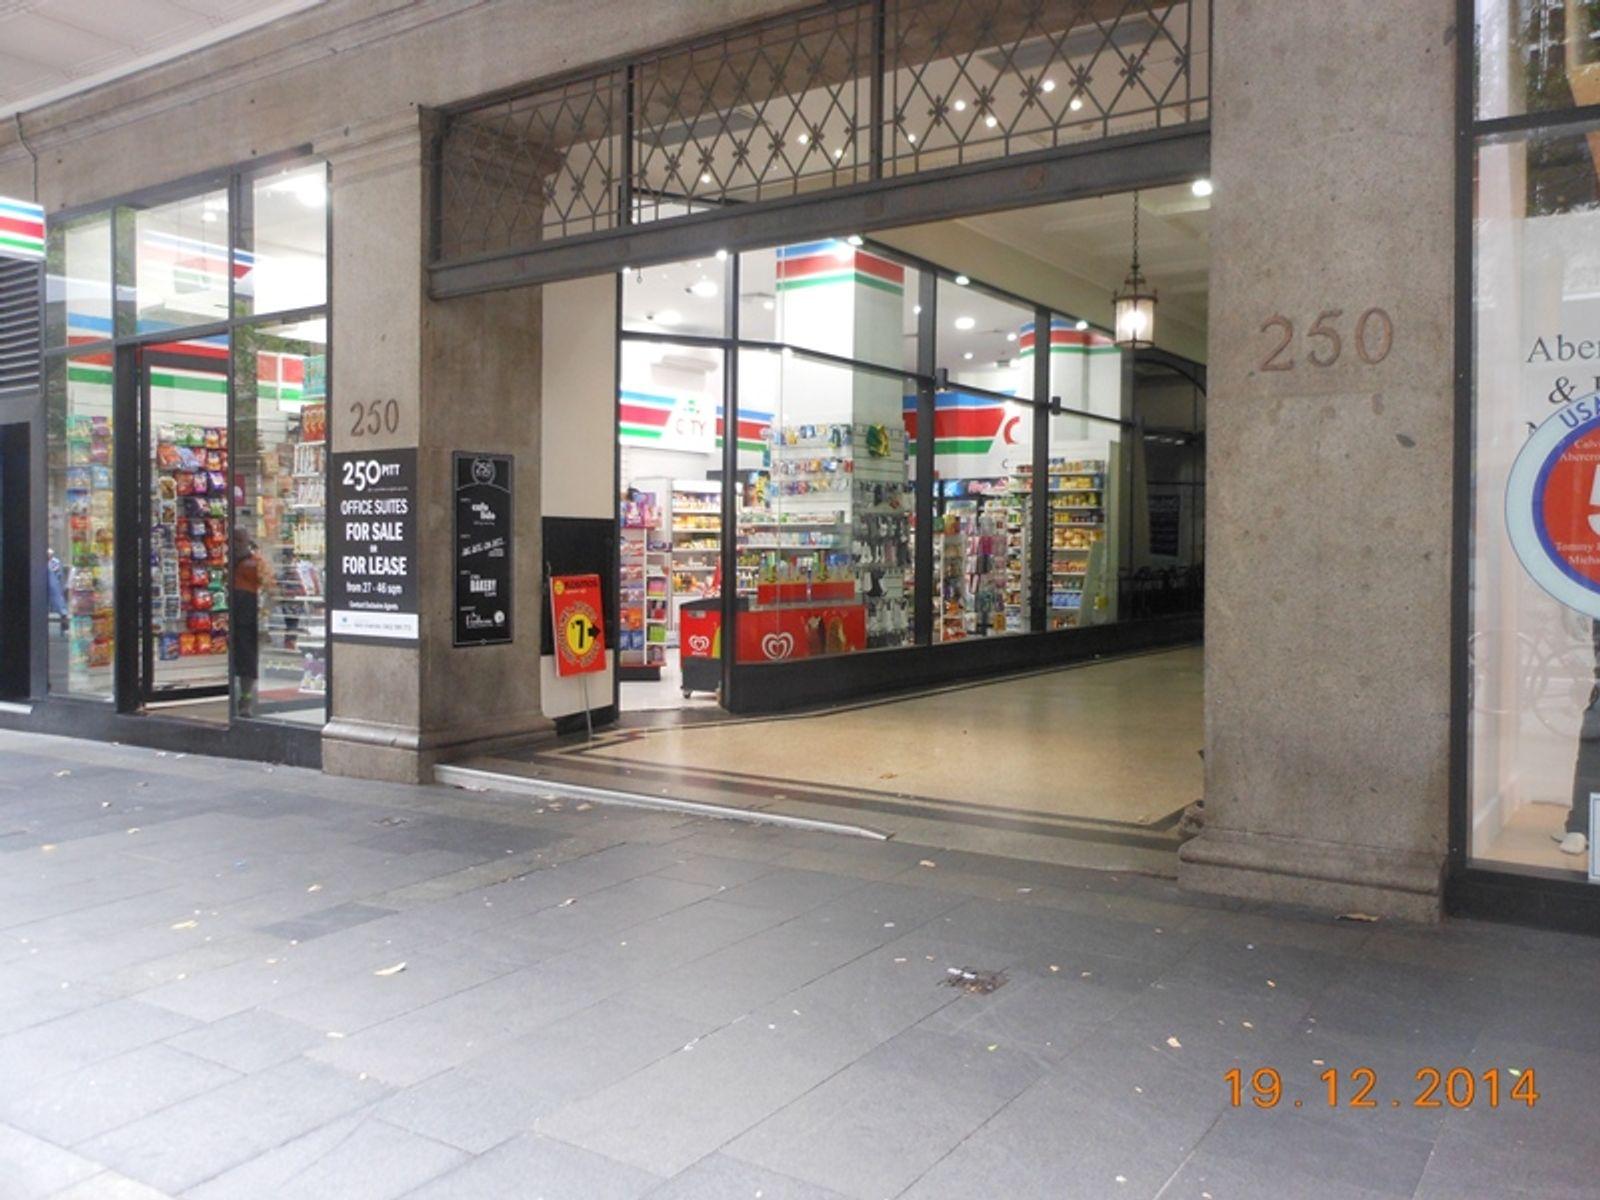 Suite 903/250 Pitt Street, Sydney, NSW 2000